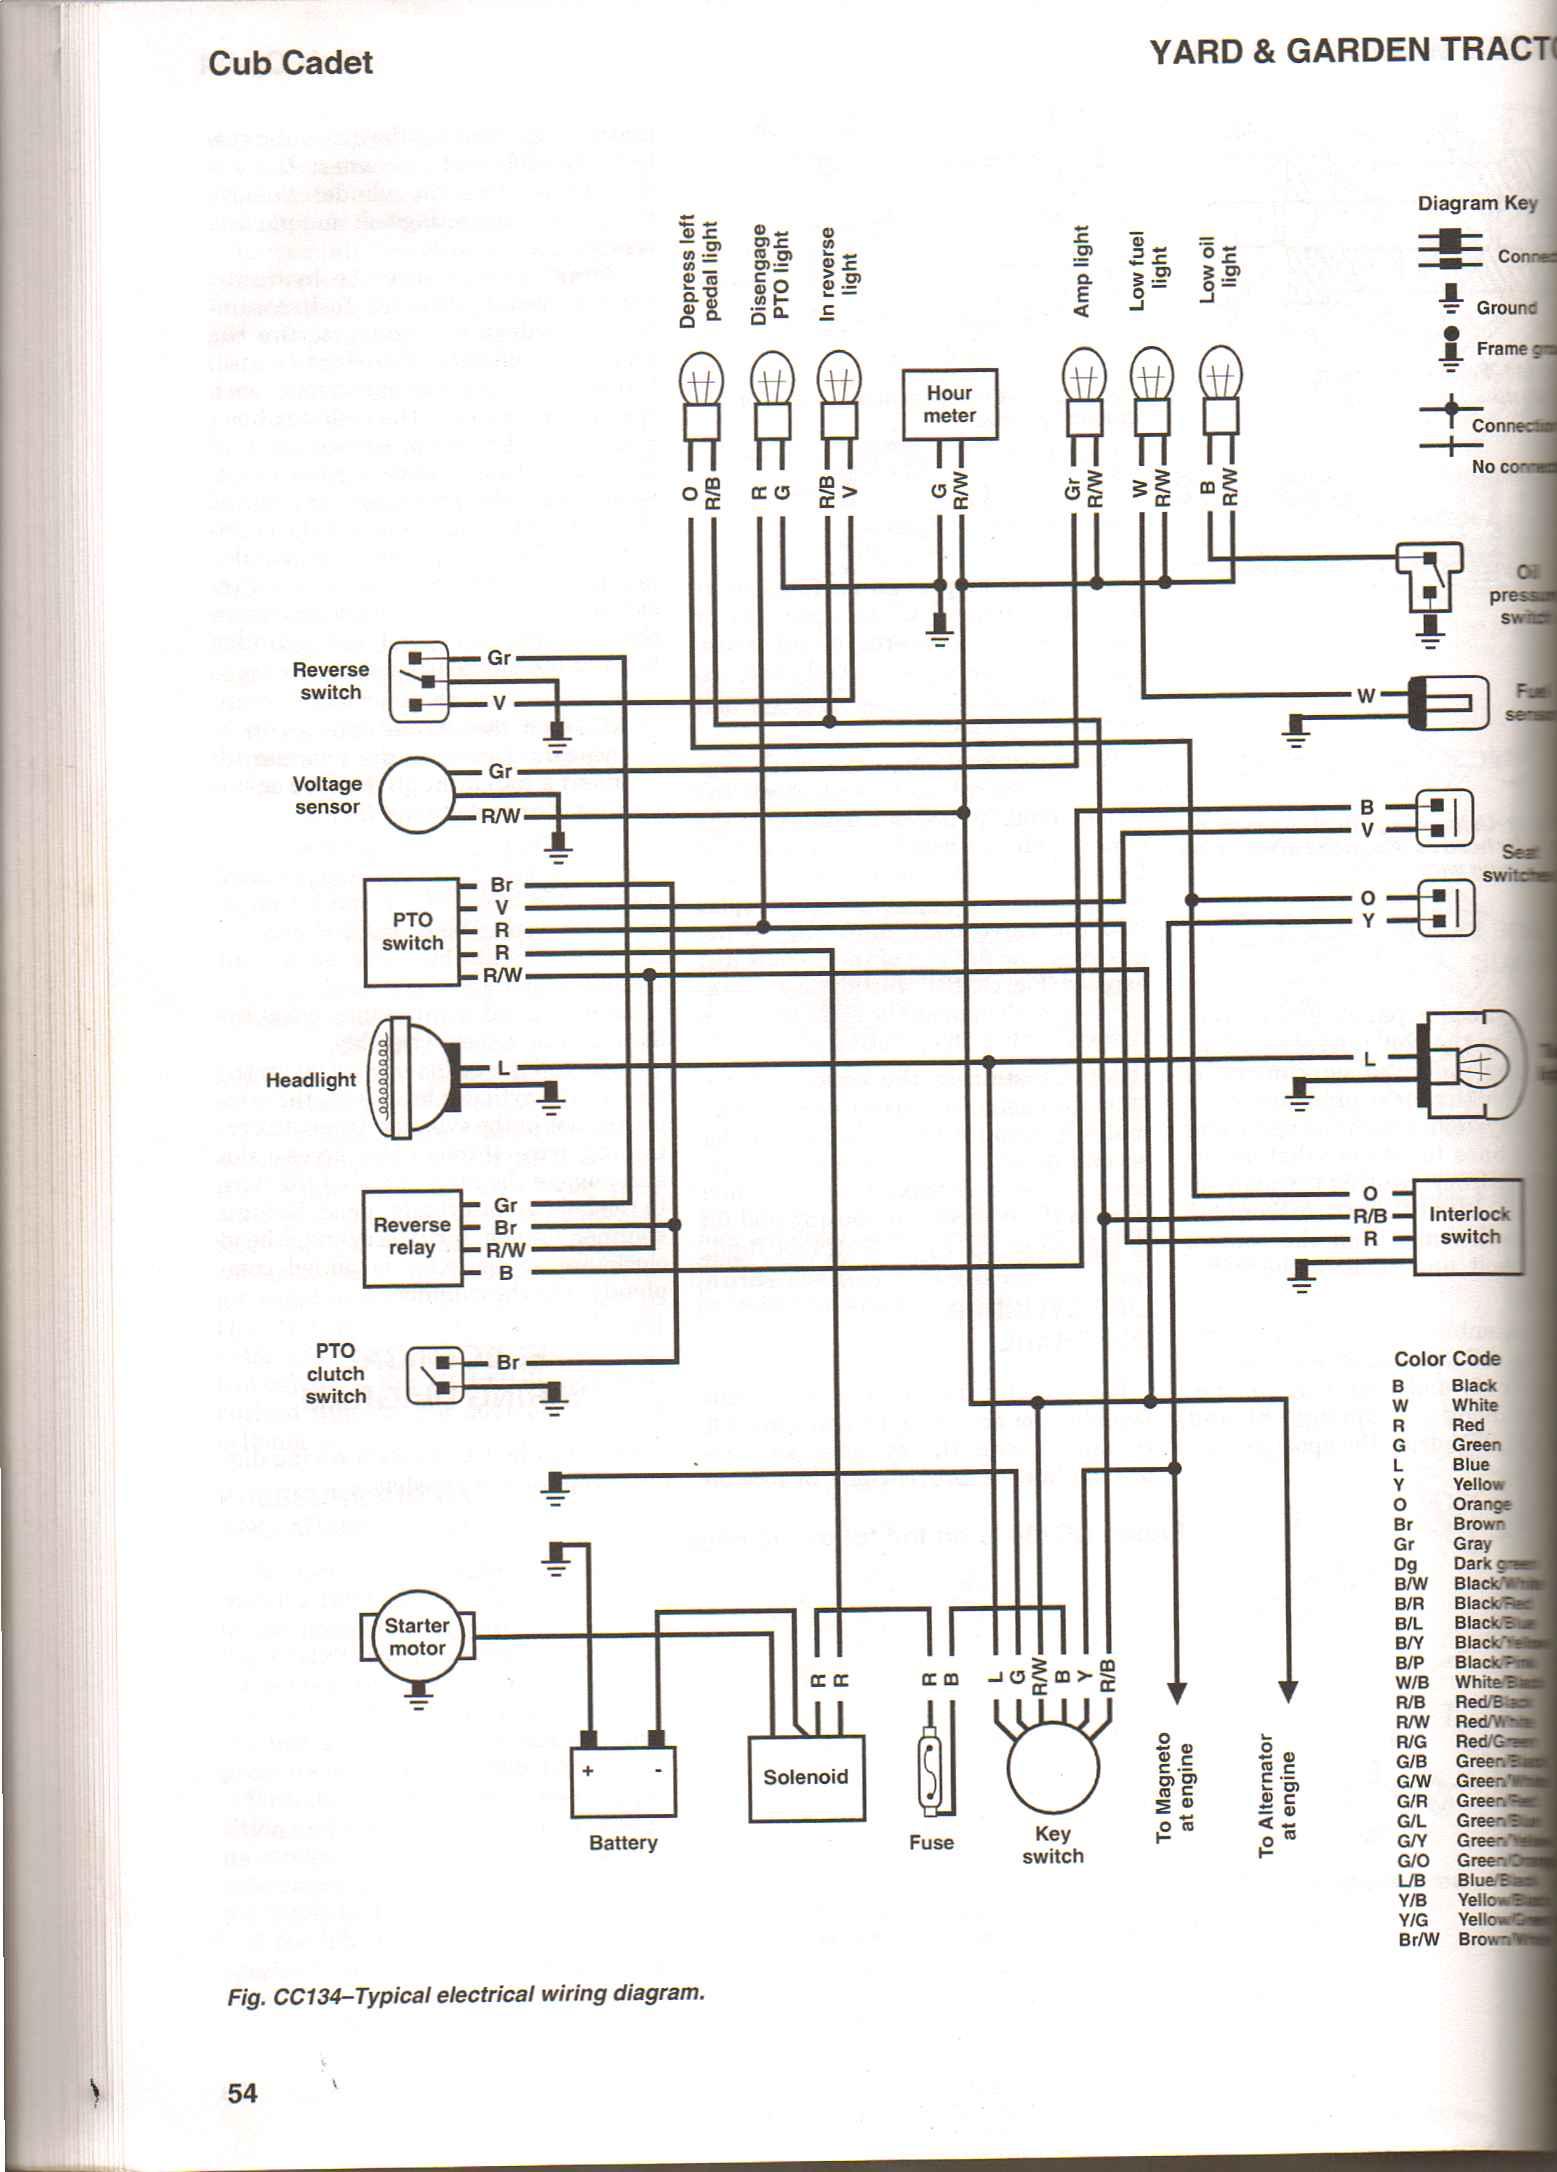 DIAGRAM] Cub Cadet Rzt 22 Wiring Diagram FULL Version HD Quality Wiring  Diagram - PUREDIAGRAM.USRDSICILIA.ITDiagram Database - usrdsicilia.it